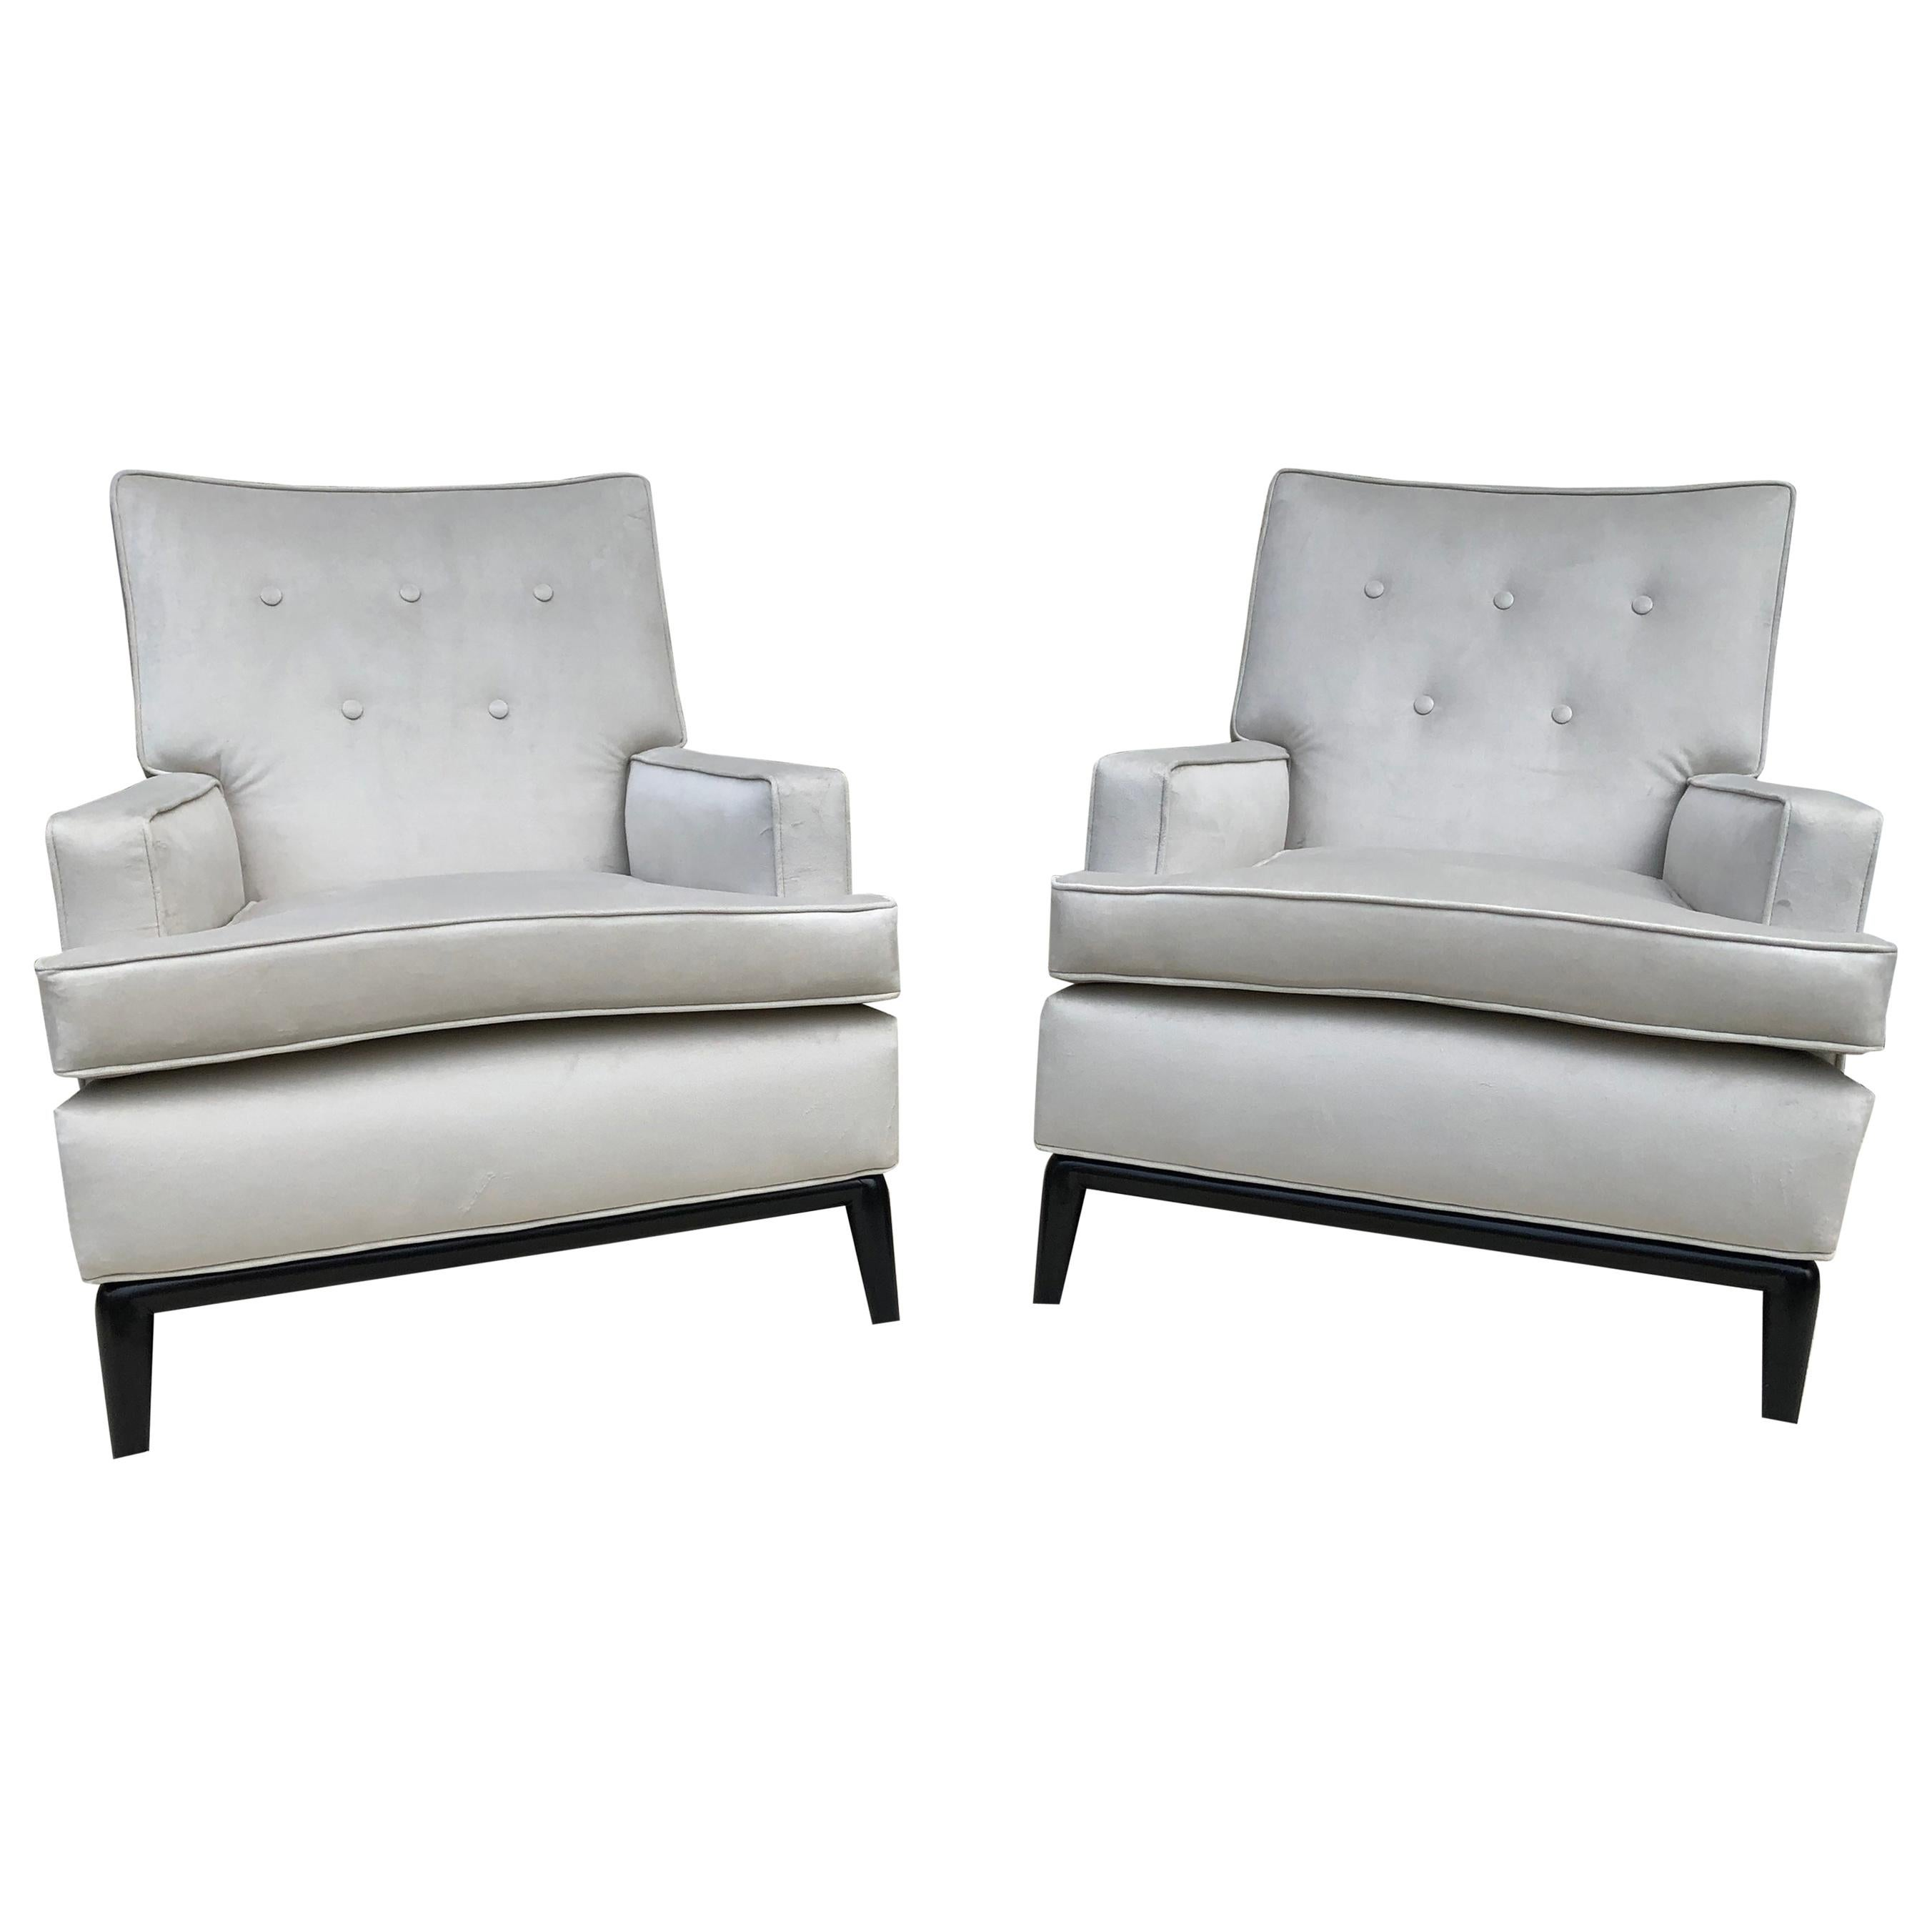 Pair of T-H Robsjohn Gibbings Club Chairs/ Lounge Chairs